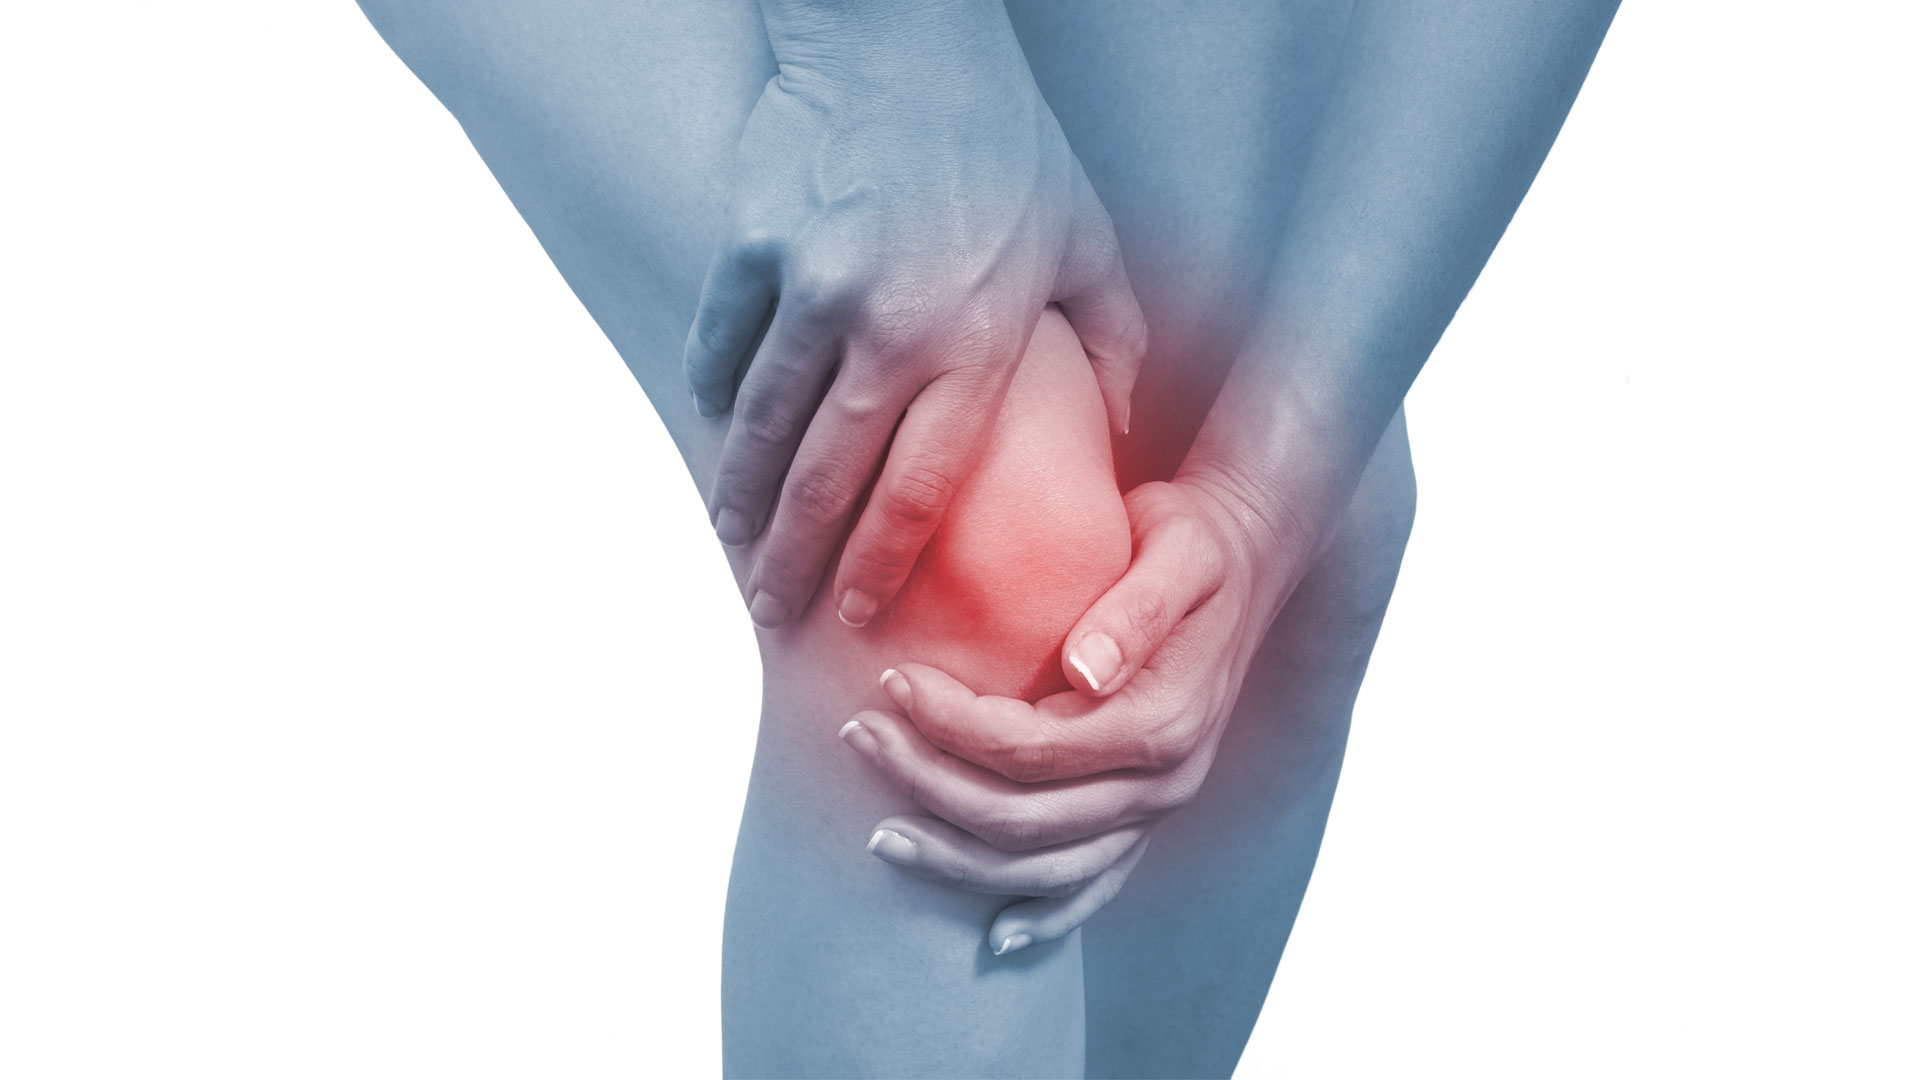 painhealth-osteoarthritis-knee-pain-white-bg